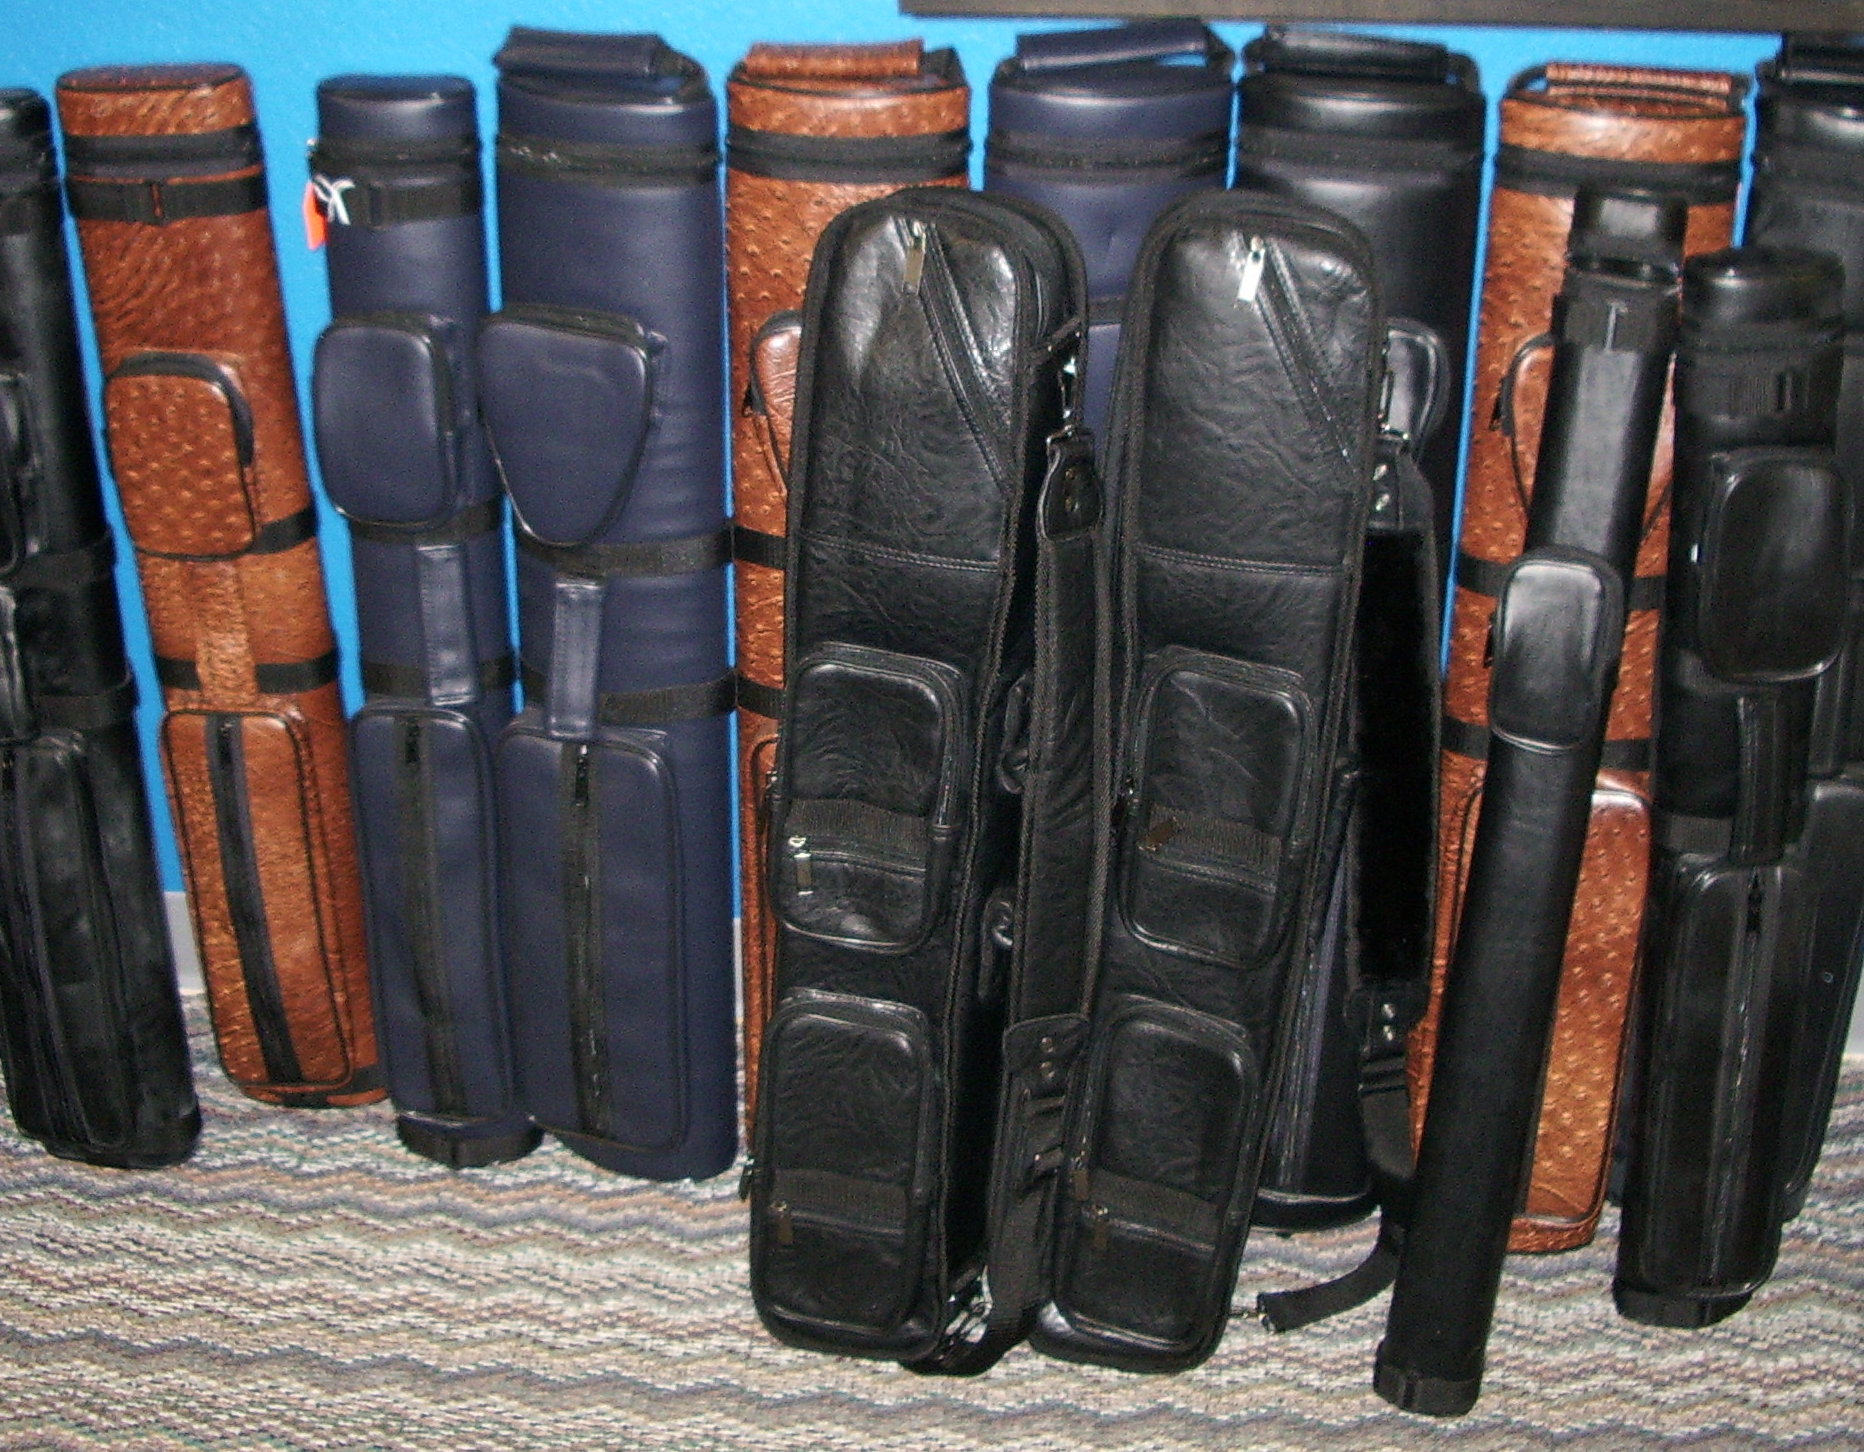 Mobile Protective Cases Market in 360MarketUpdates.com